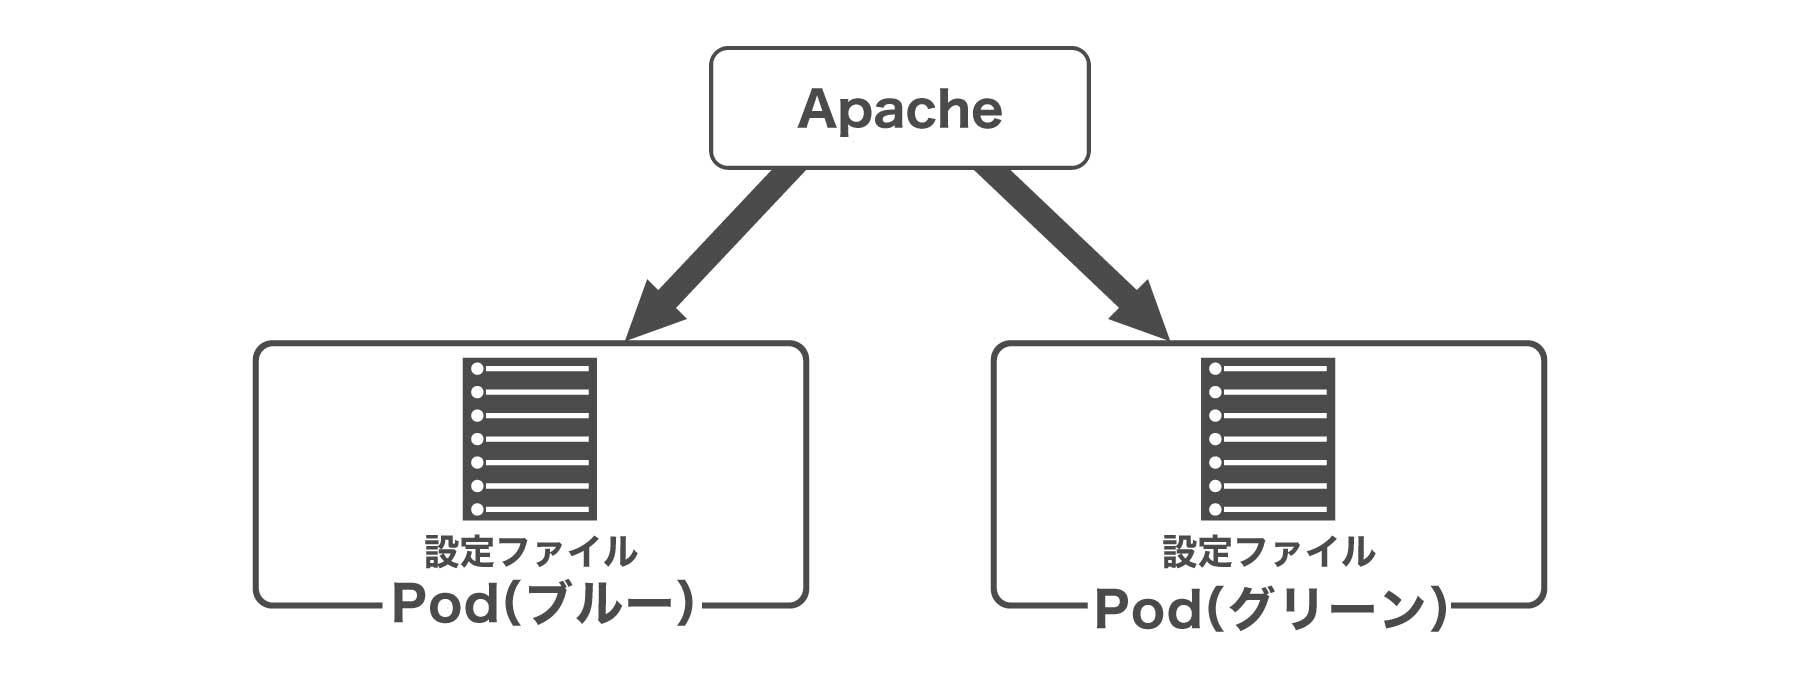 SPEEDAのシステム構成